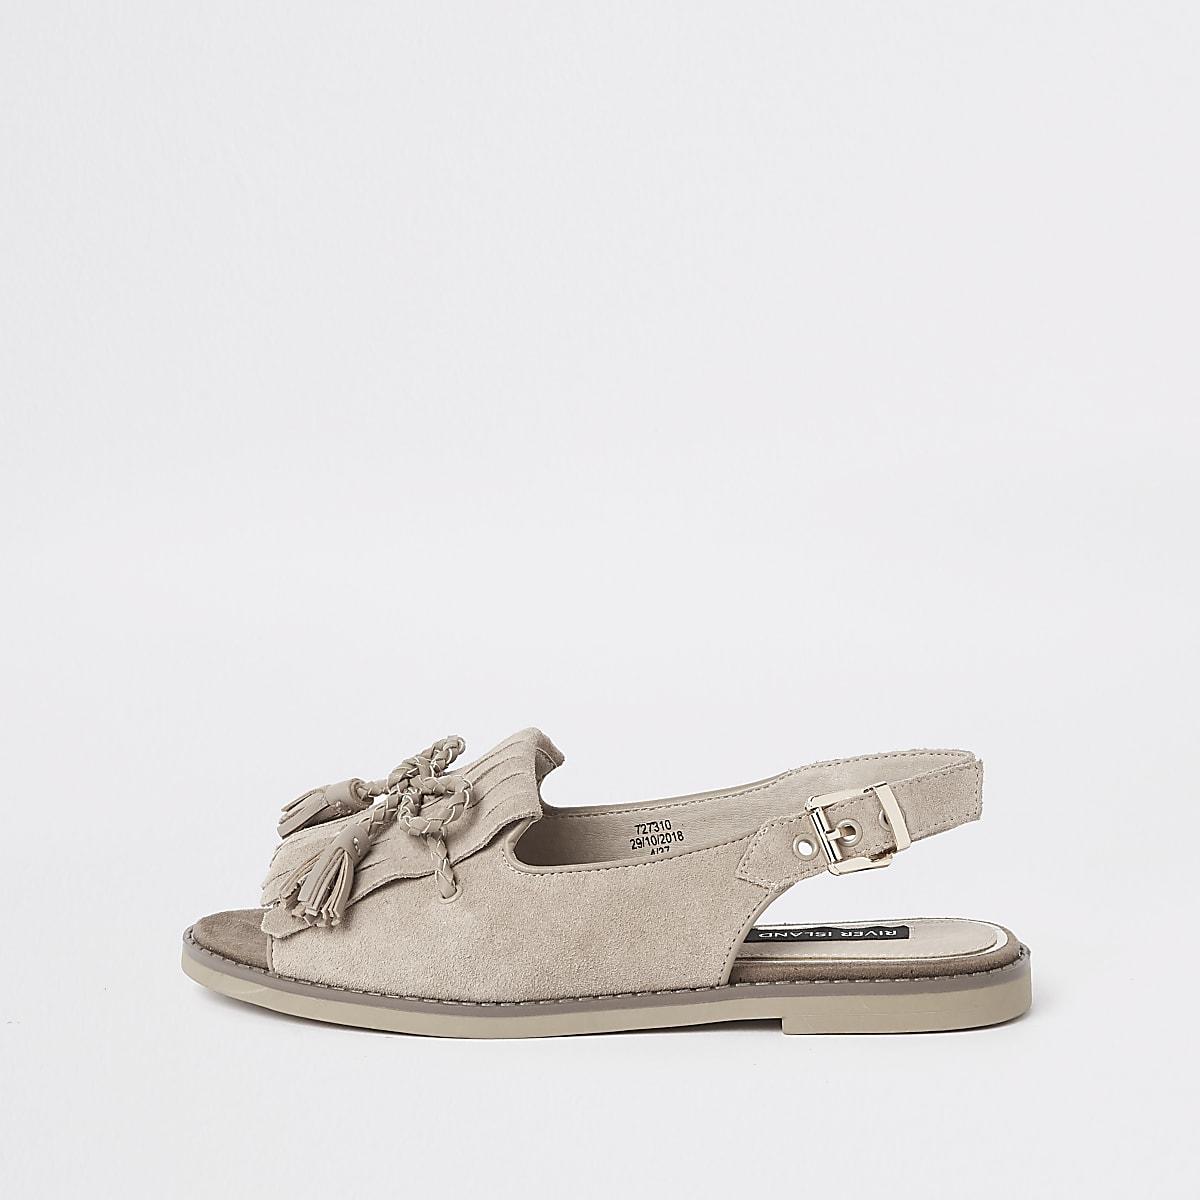 Beige suede tassel front peep toe sandals